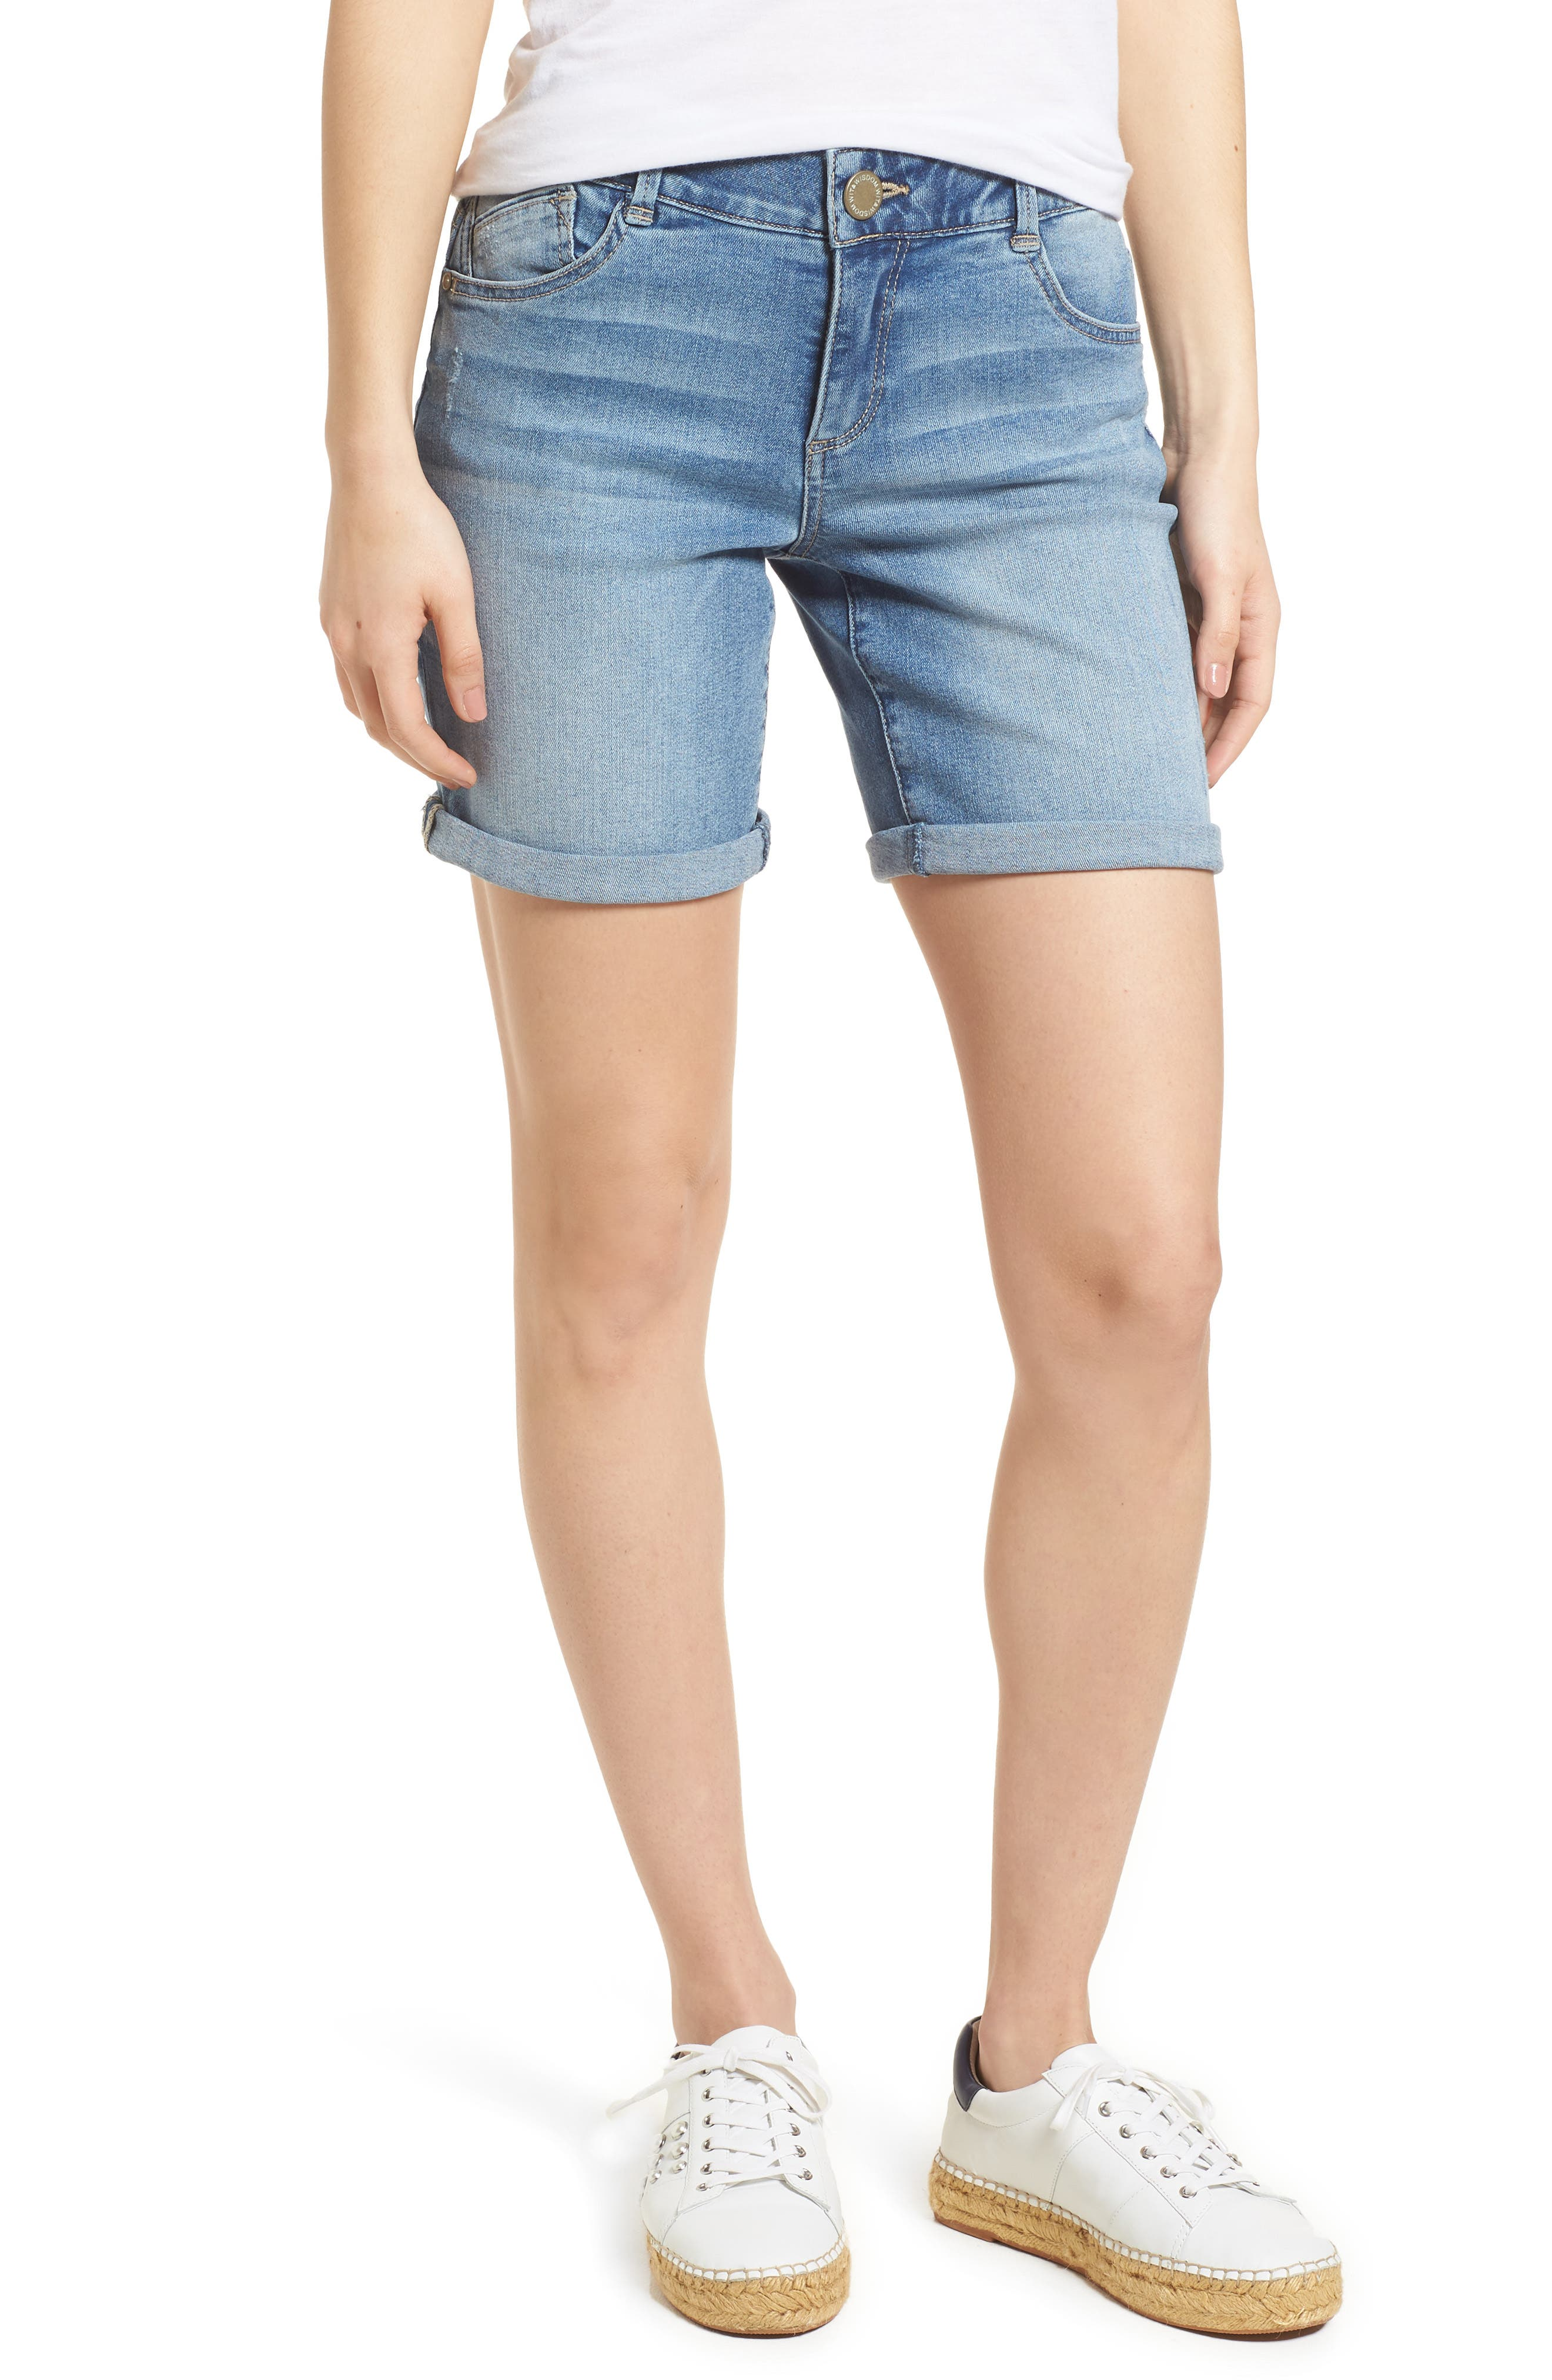 Ab-solution Denim Bermuda Shorts,                         Main,                         color, Light Blue